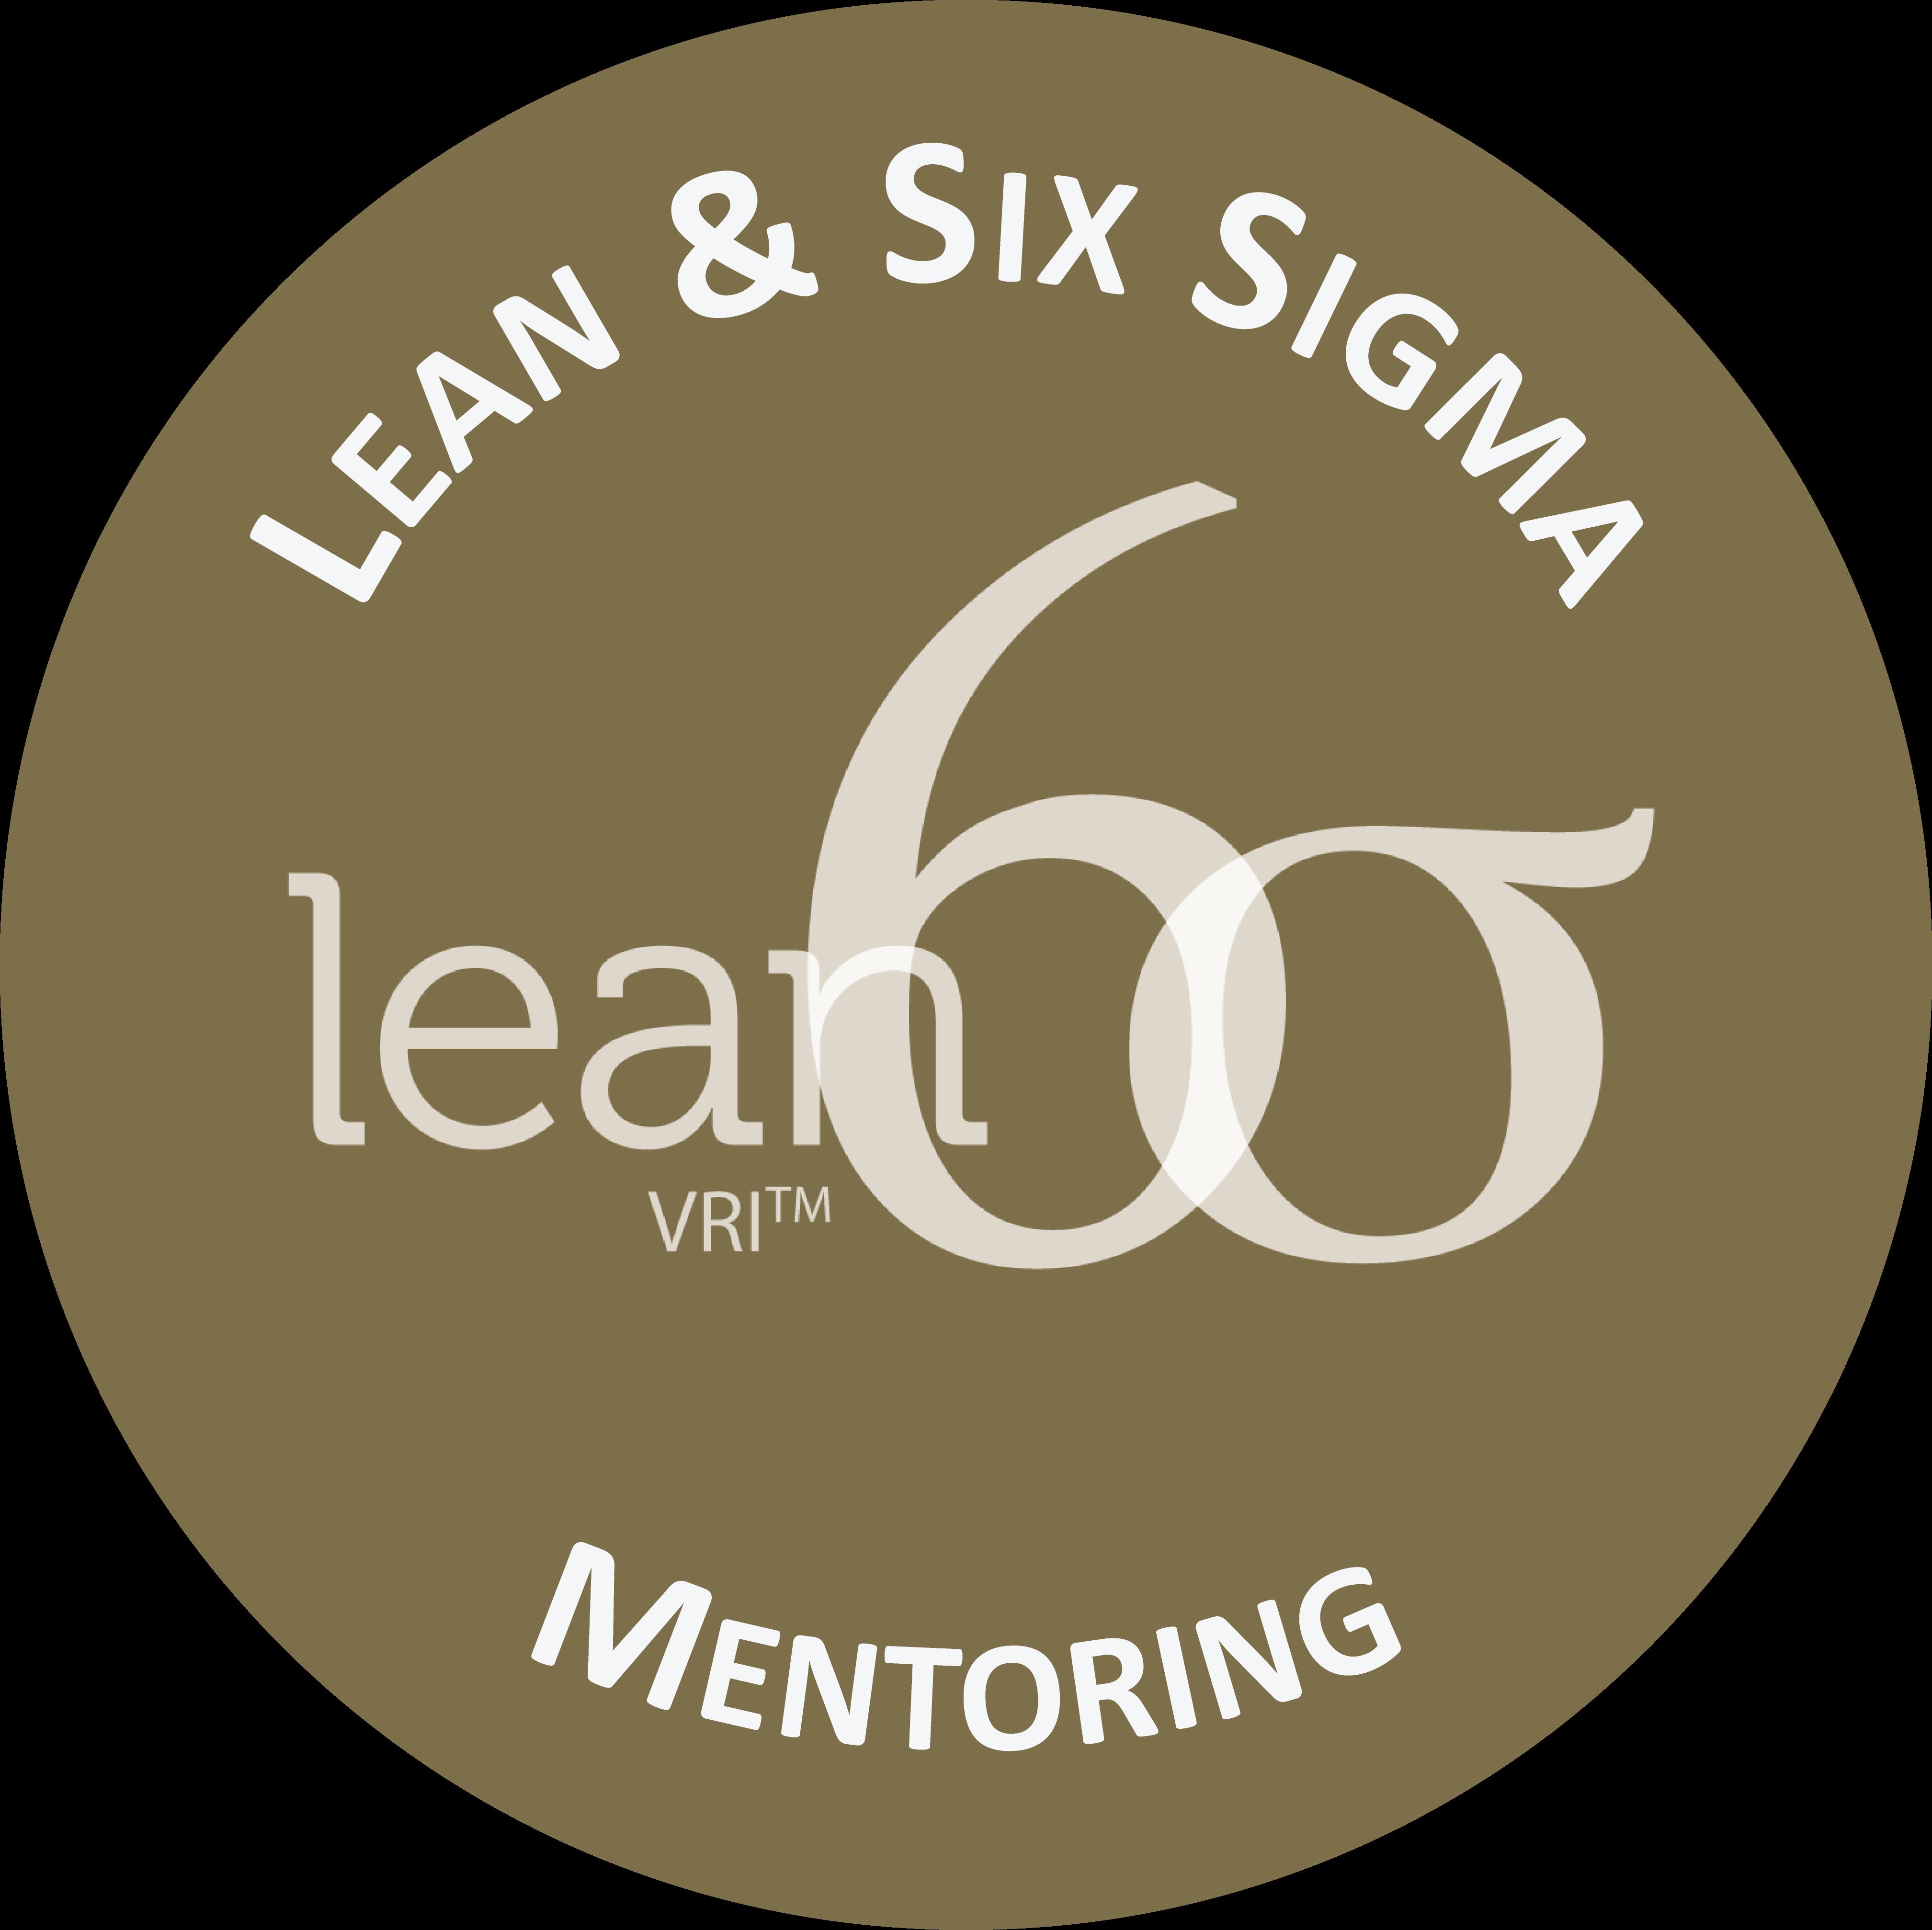 Lean & Six Sigma Mentoring